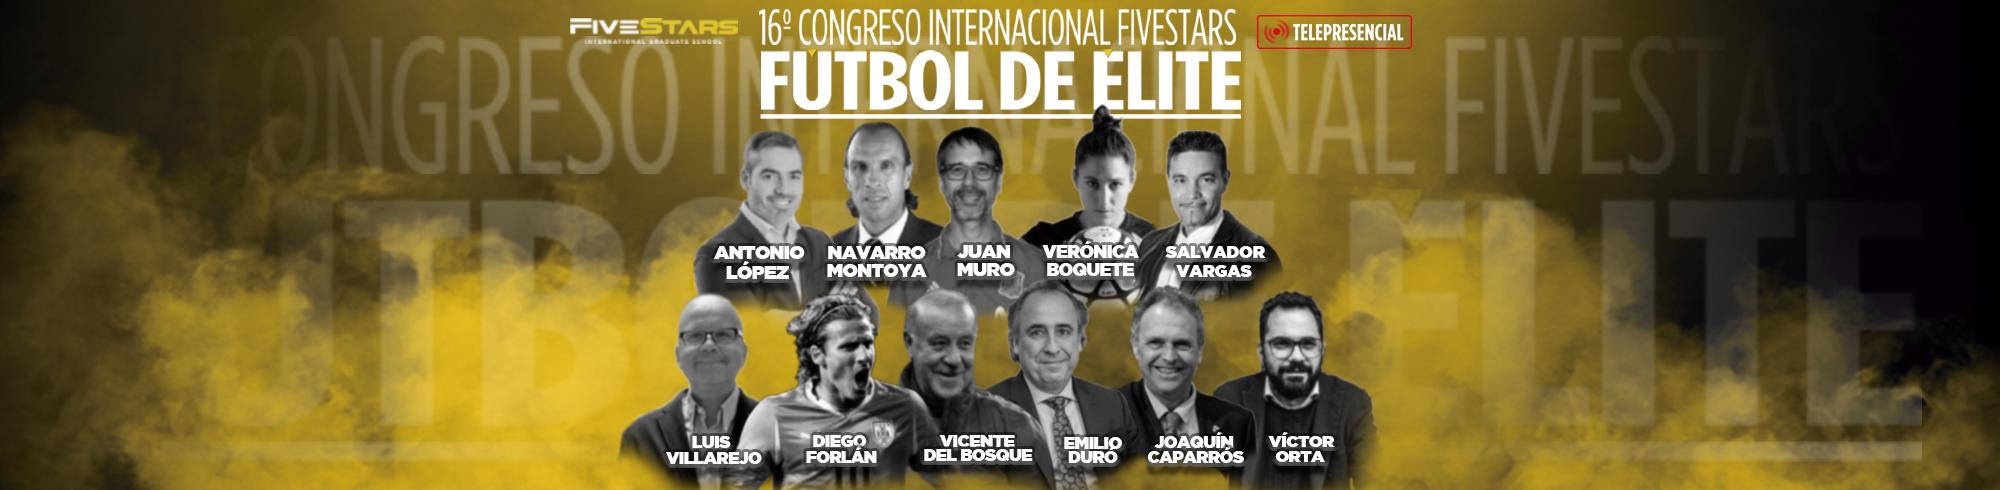 congreso futbol de élite